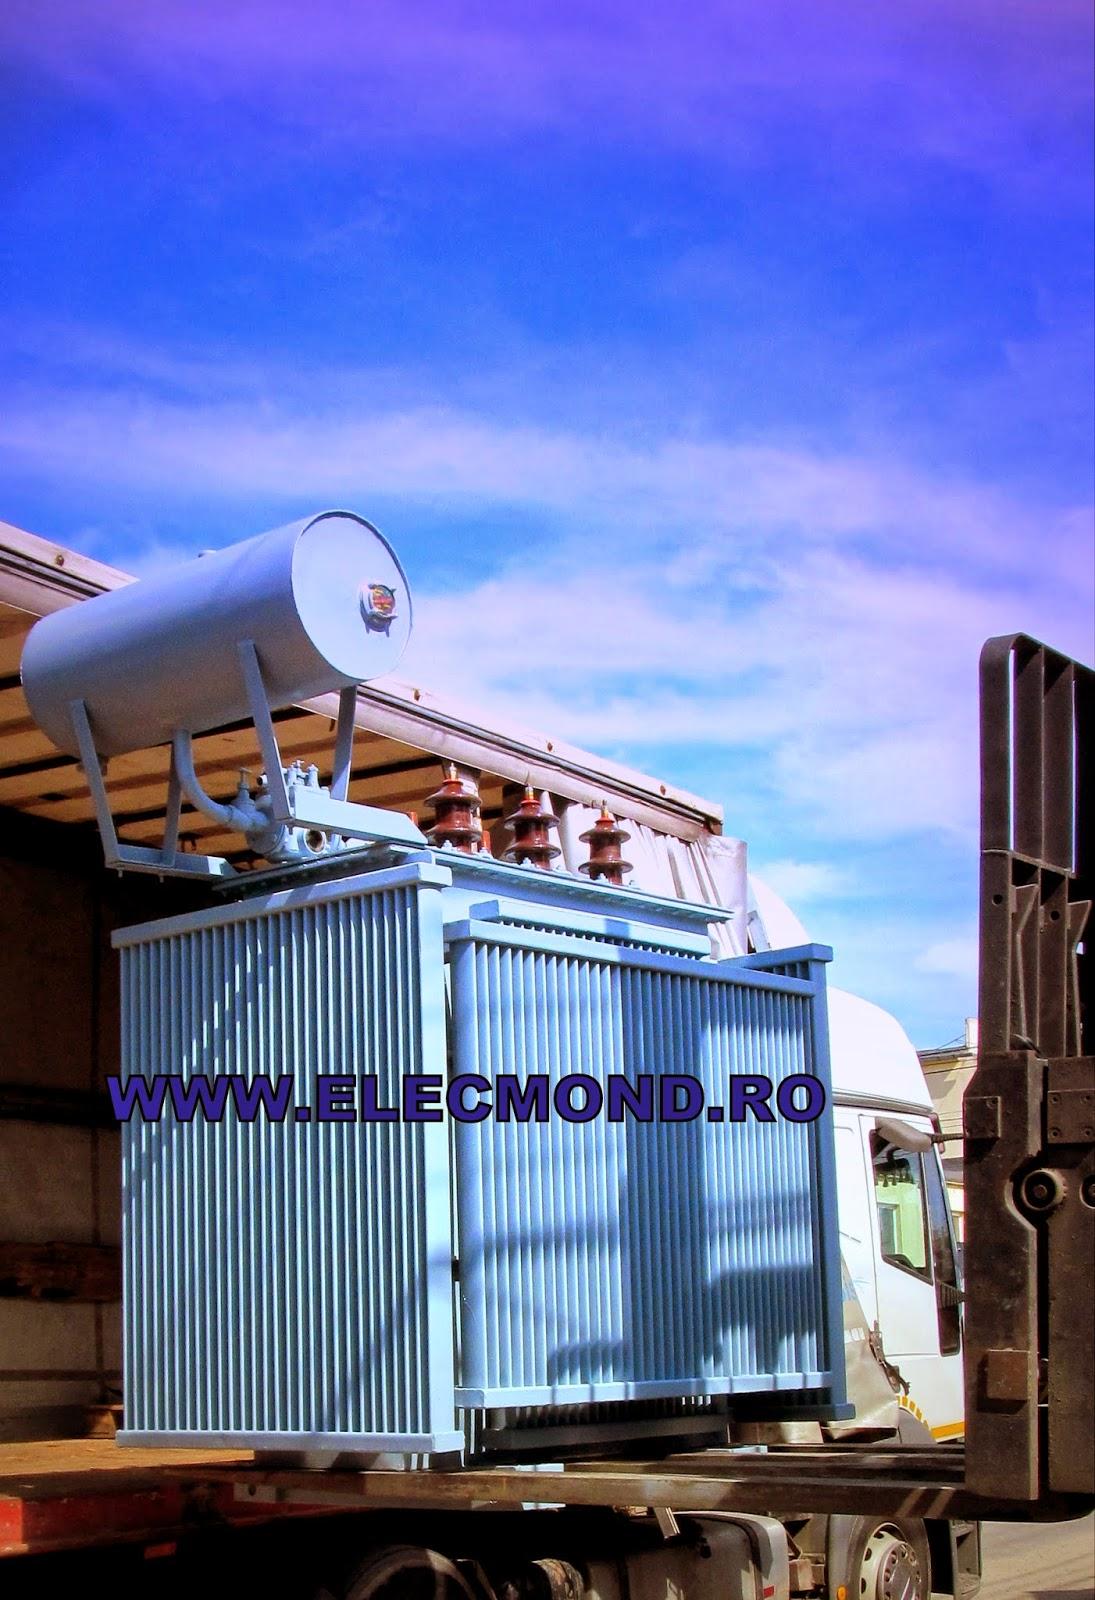 Transformatoare , transformator 1000 kVA transformator 1600 kVA , transformatoare de putere , fabrica transformatoare , reparatii transformatoare , transformator 400 kVA , trafo 1000 , trafo 1600 , trafo 400 kVA , transformator 400 kVA